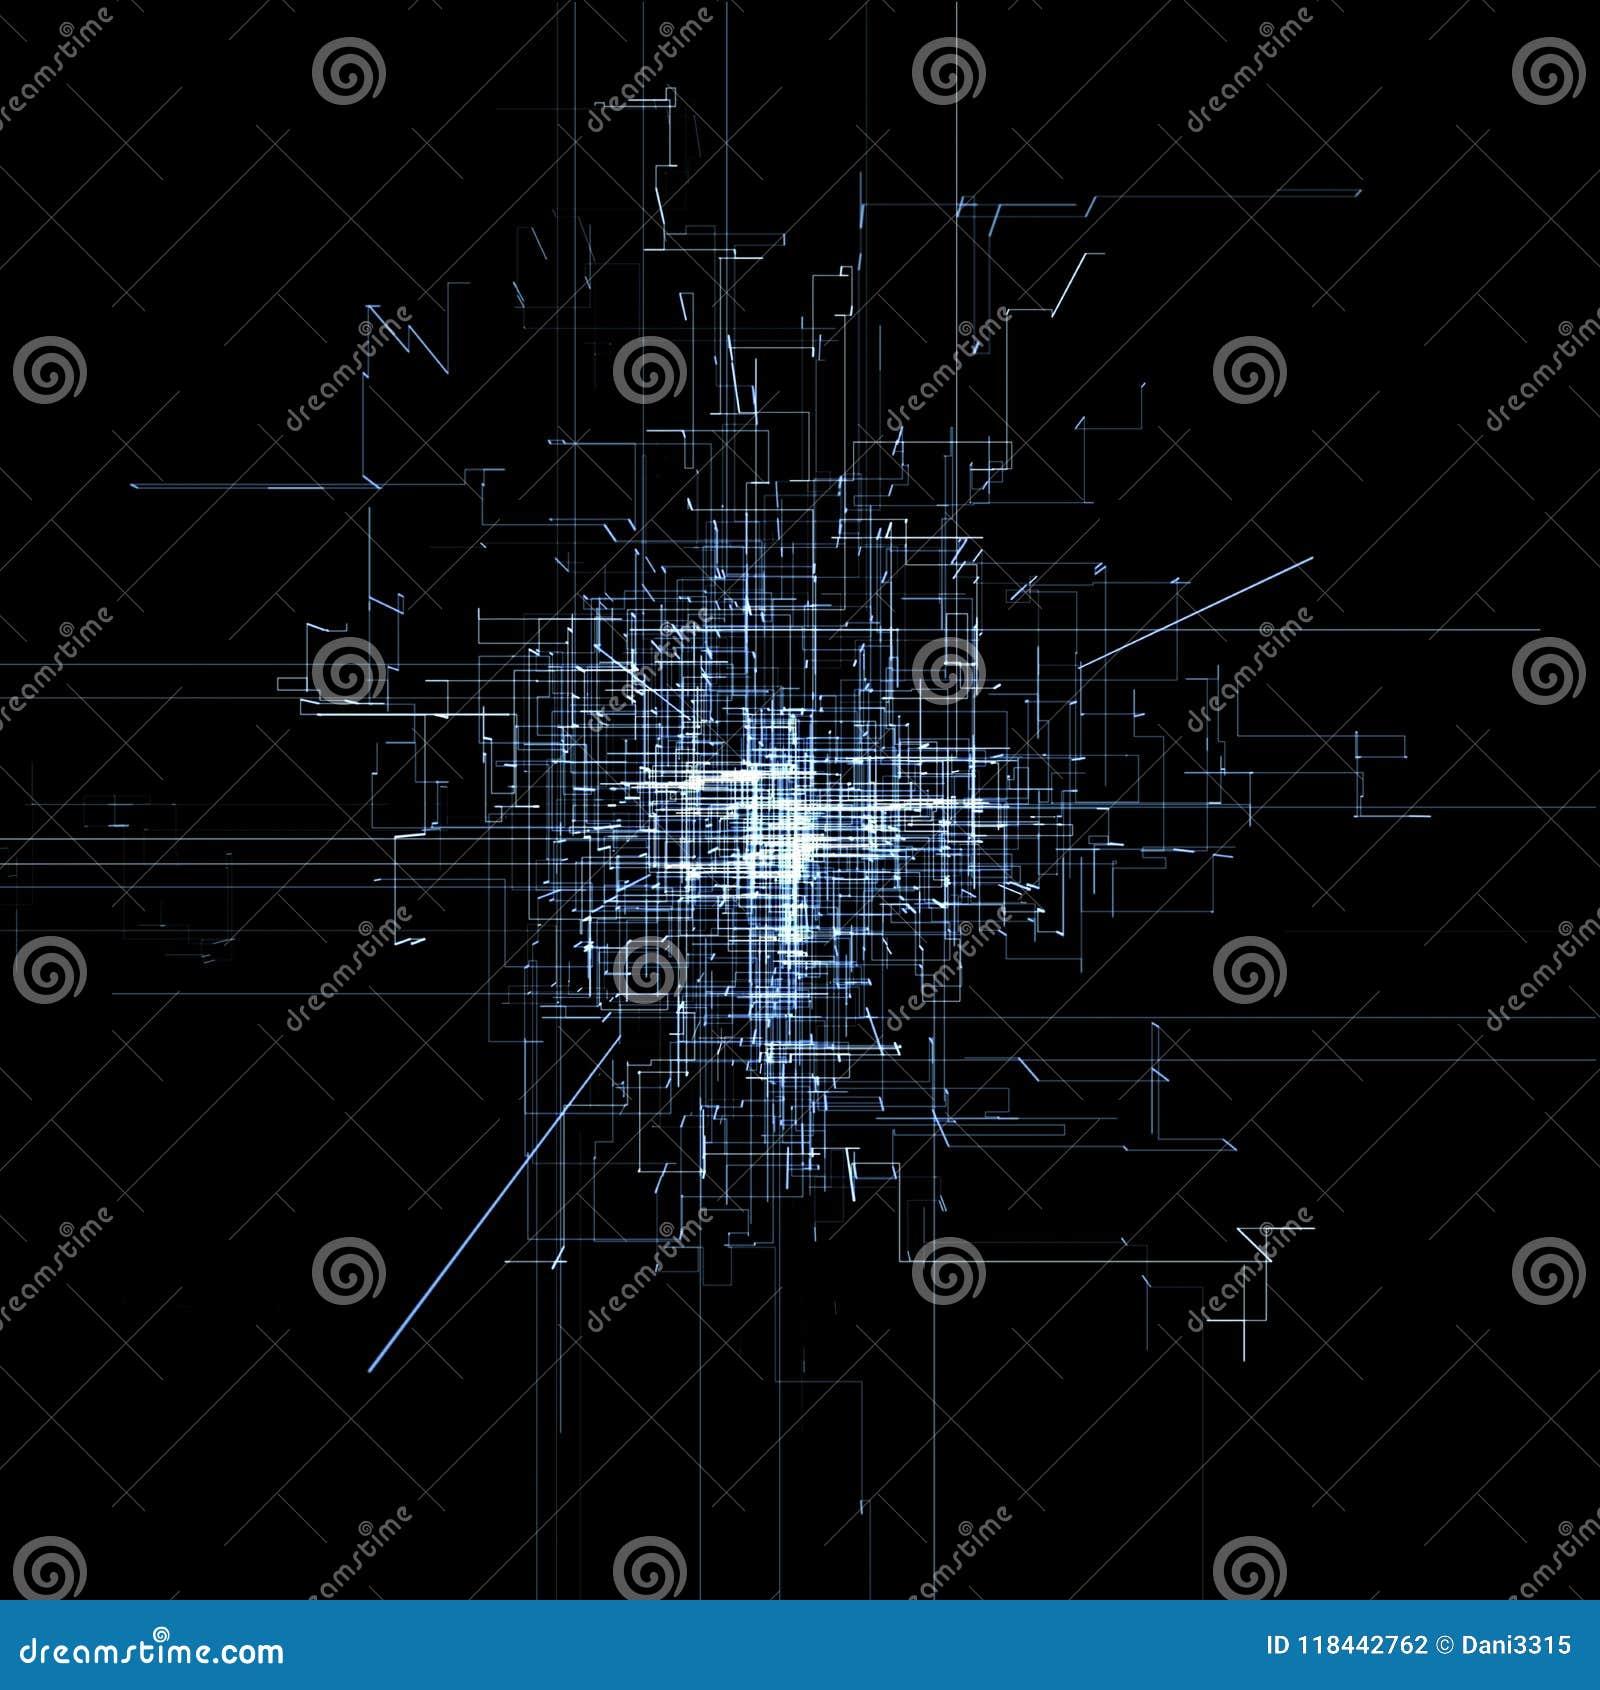 Circuito Eletronico : Placa de circuito eletrônico moderna condutores e sinais neurais